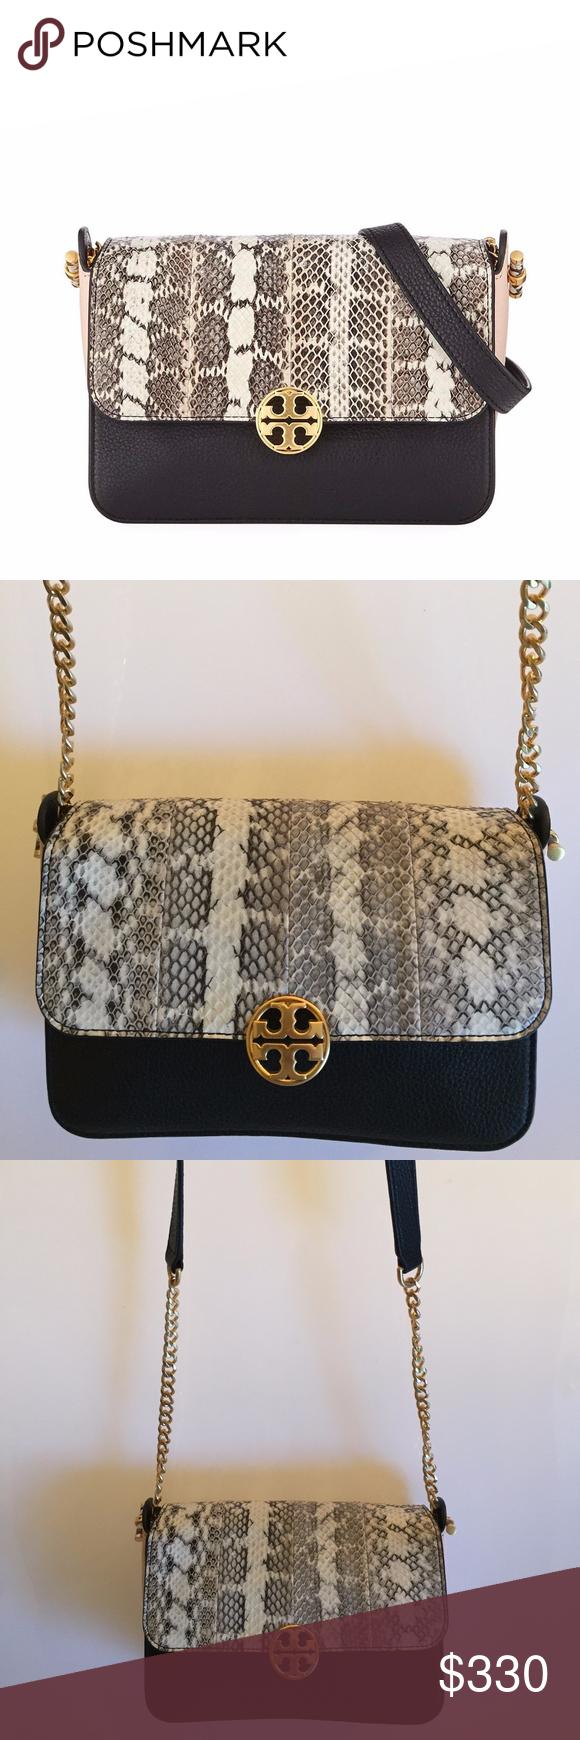 f3ff2c8091 Tory Burch Chelsea Colorblock Snake Crossbody Bag **NWOT** Color: Black/